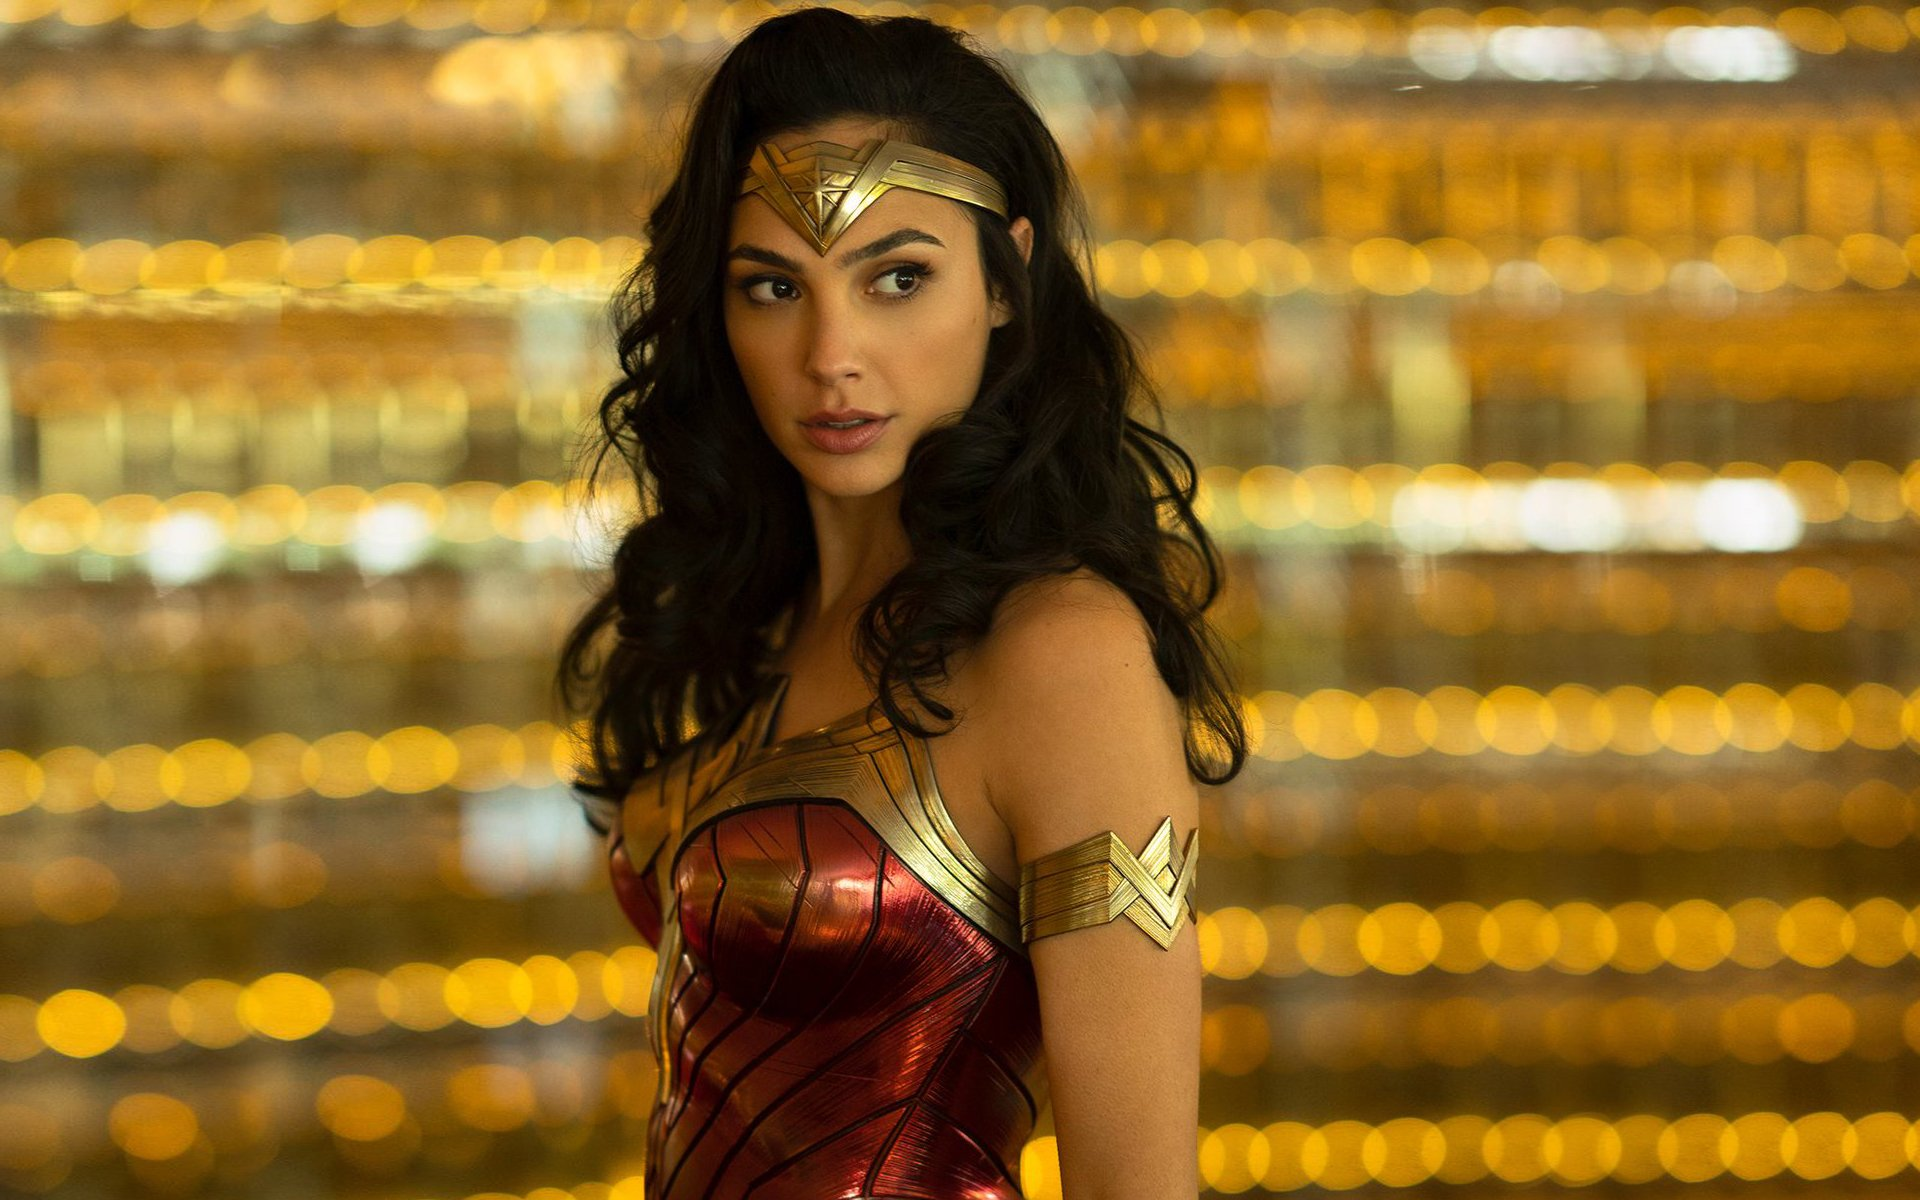 Wonder Woman 1984 Fondo De Pantalla Hd Fondo De Escritorio